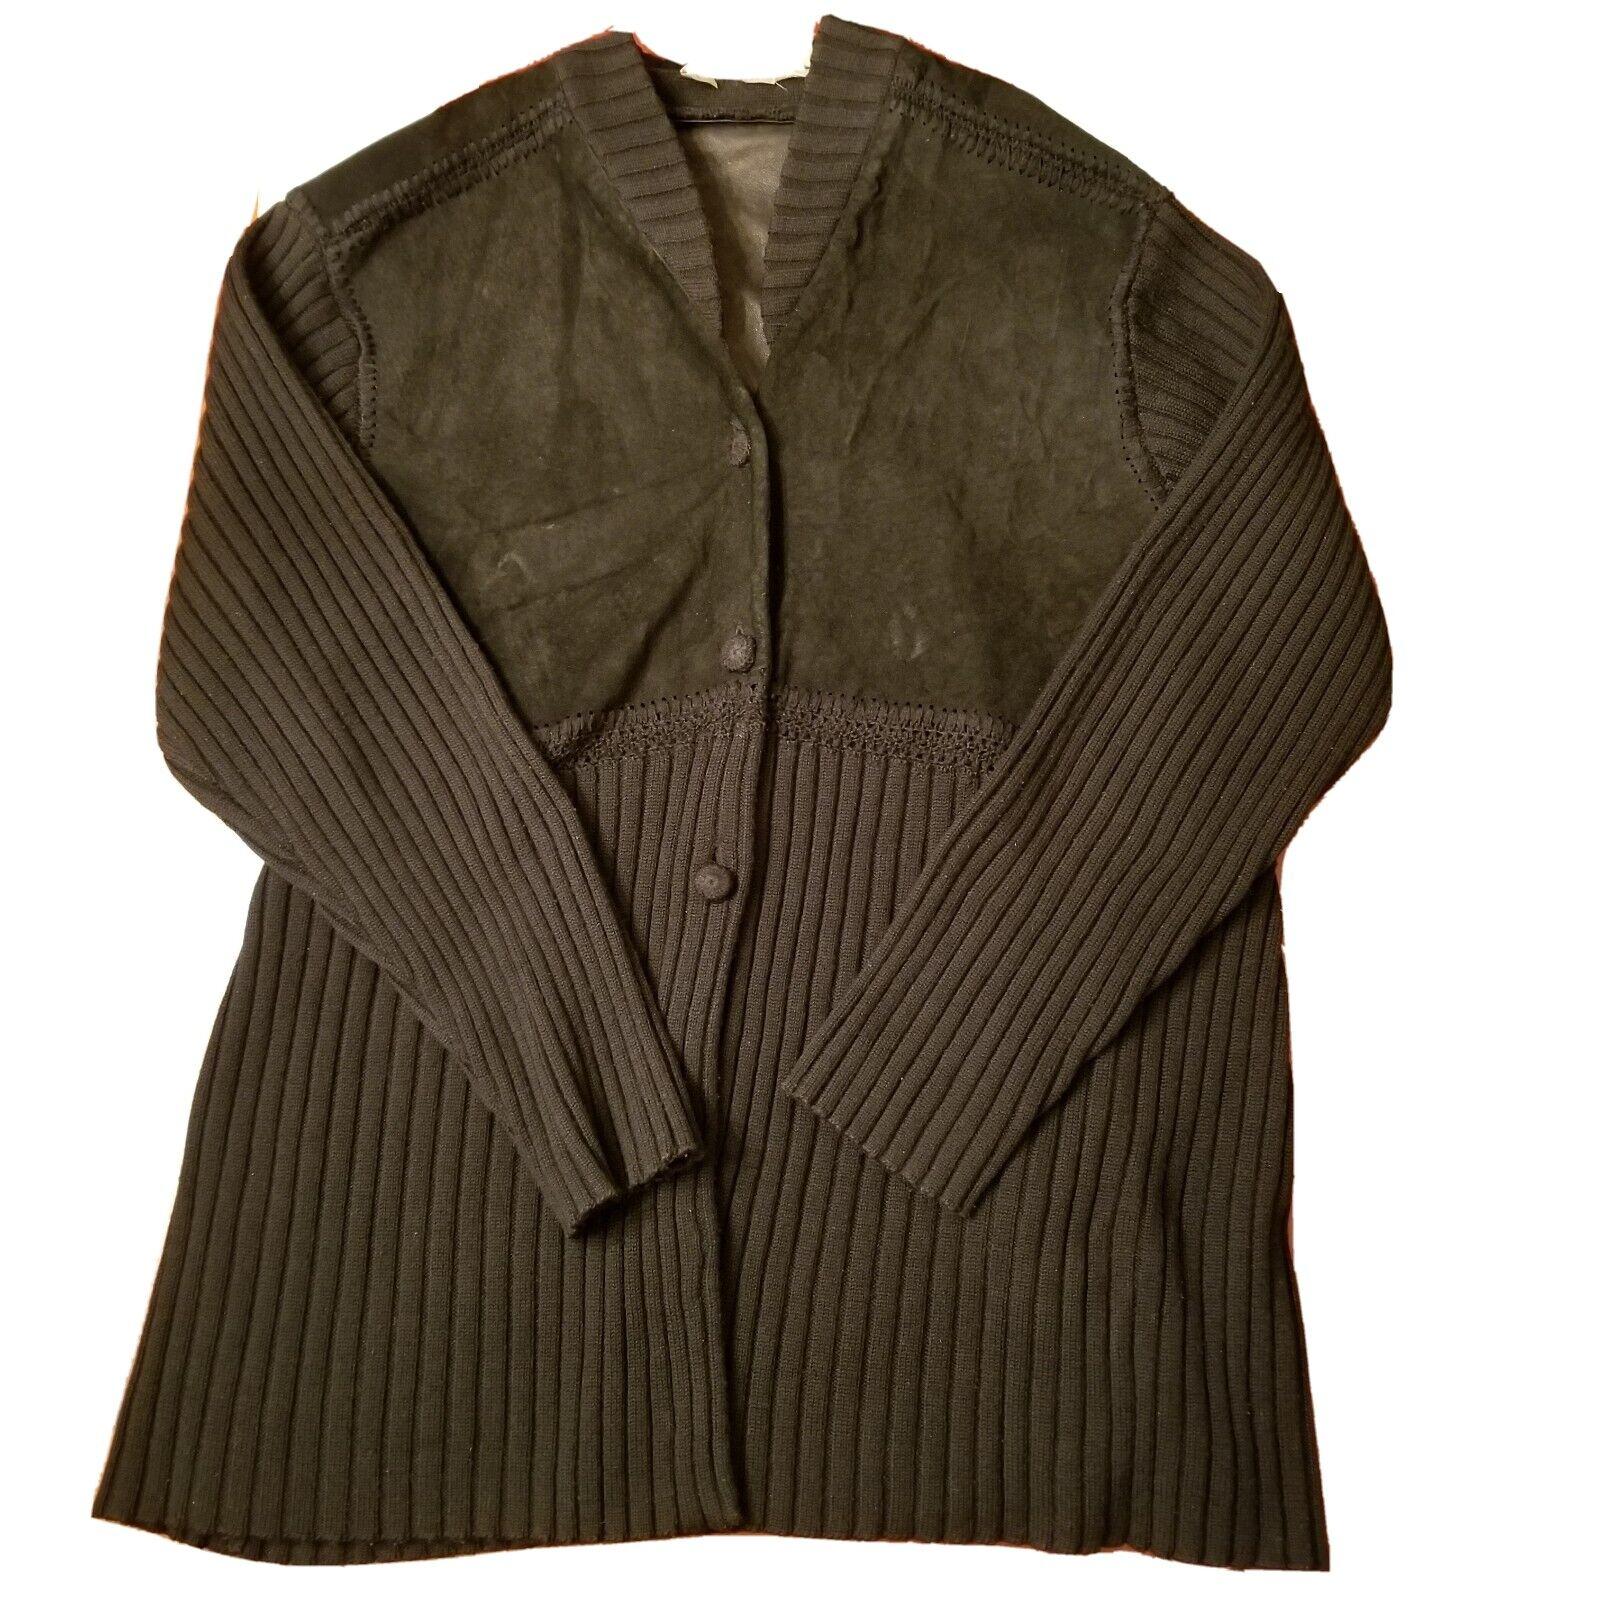 J Jill Cardigan  Wool/suede Leather Blend Woven L… - image 2